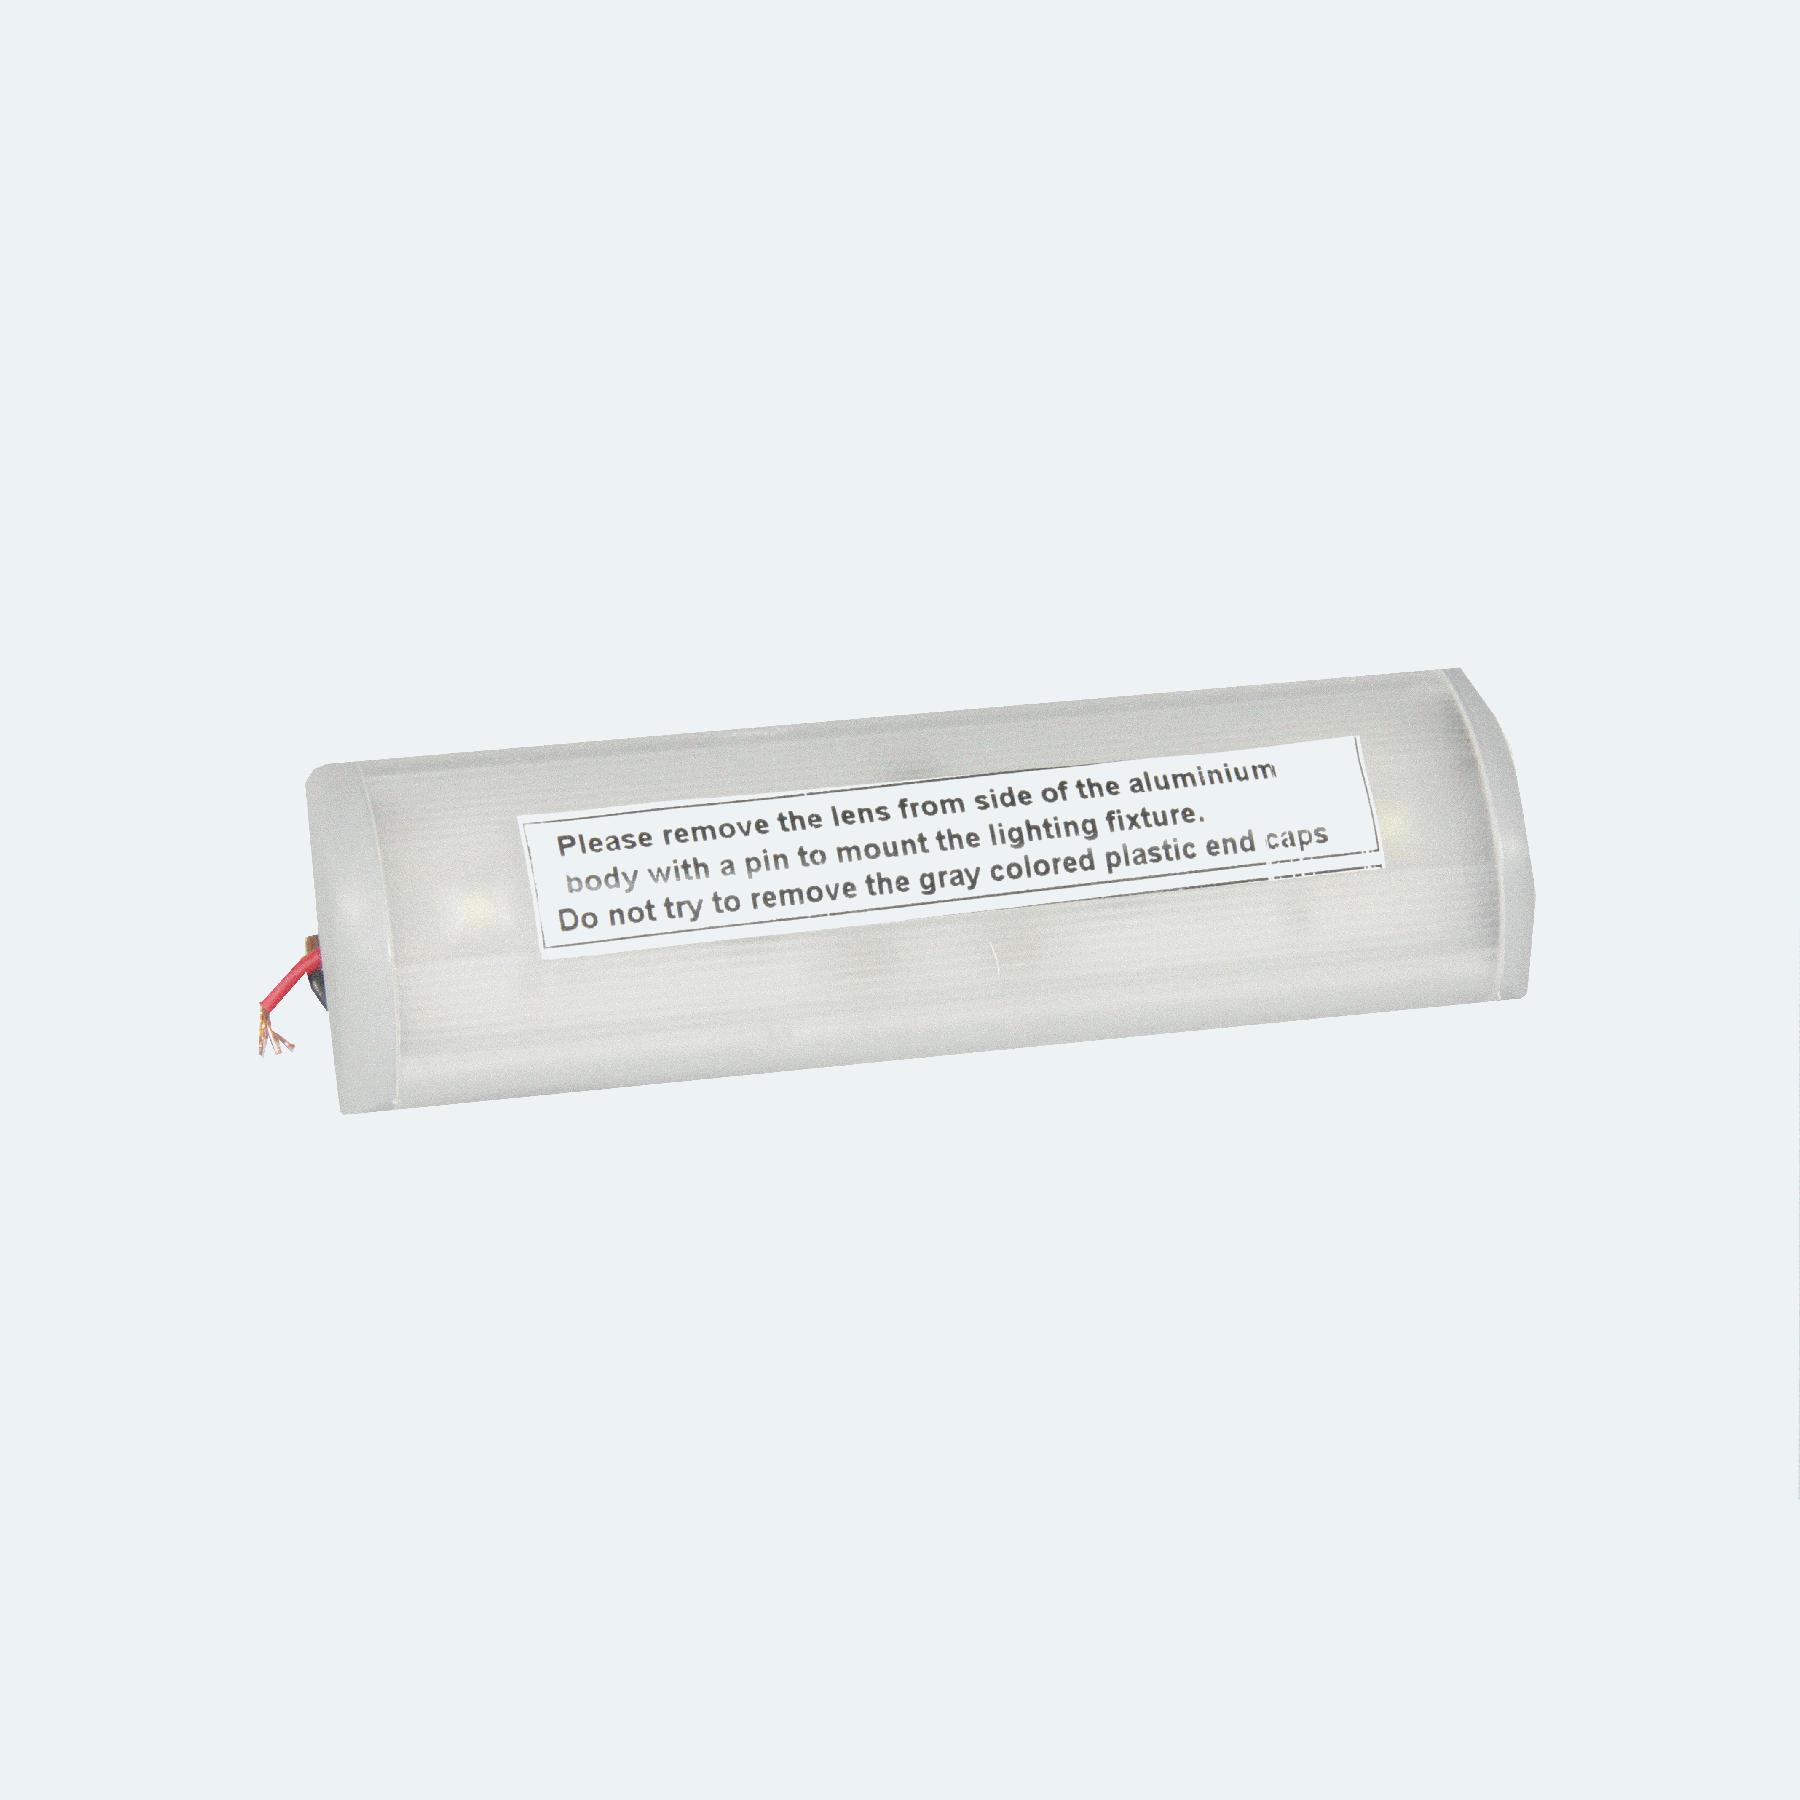 Interieurlamp LED wit 130x37mm 24v